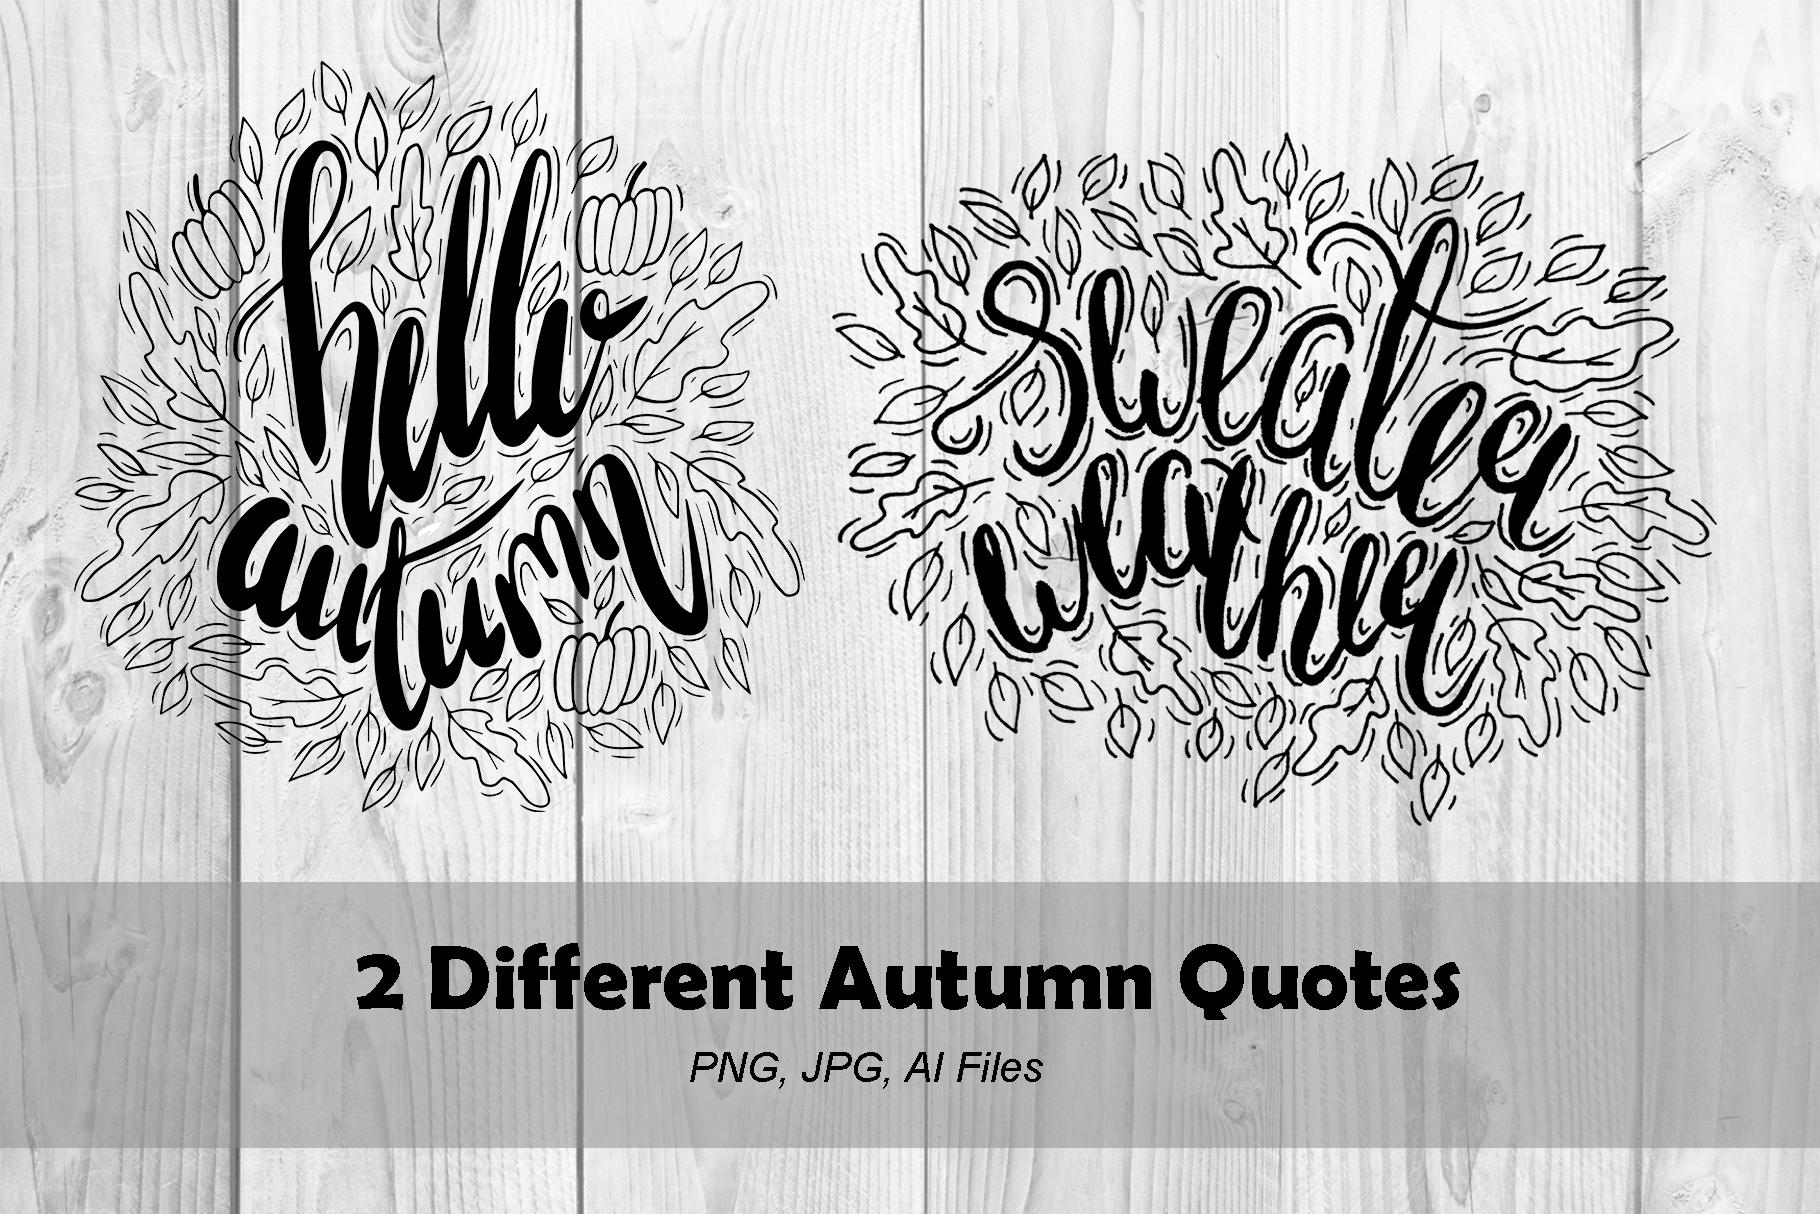 Autumn Quotes example image 1